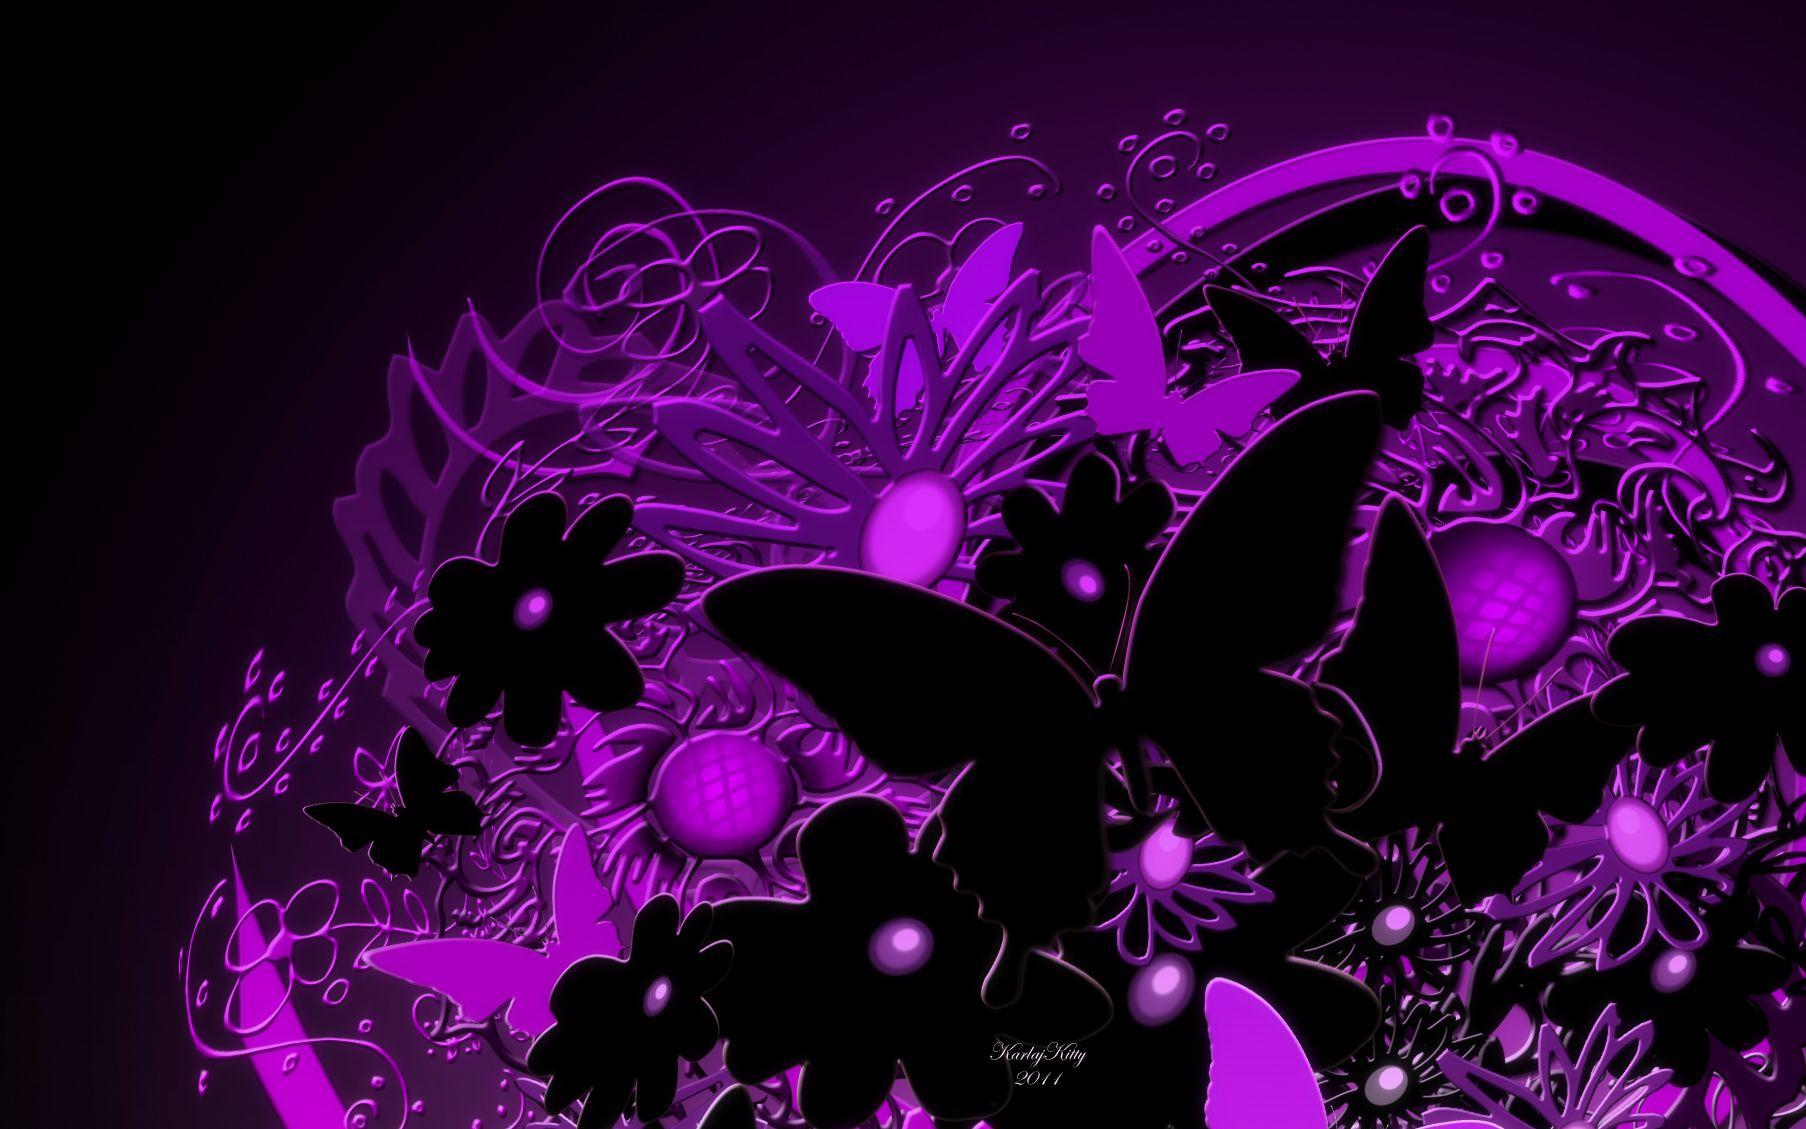 Good Wallpaper High Quality Purple - db173032ddcafa14fc63c04a726f9b59  Best Photo Reference_773778.jpg